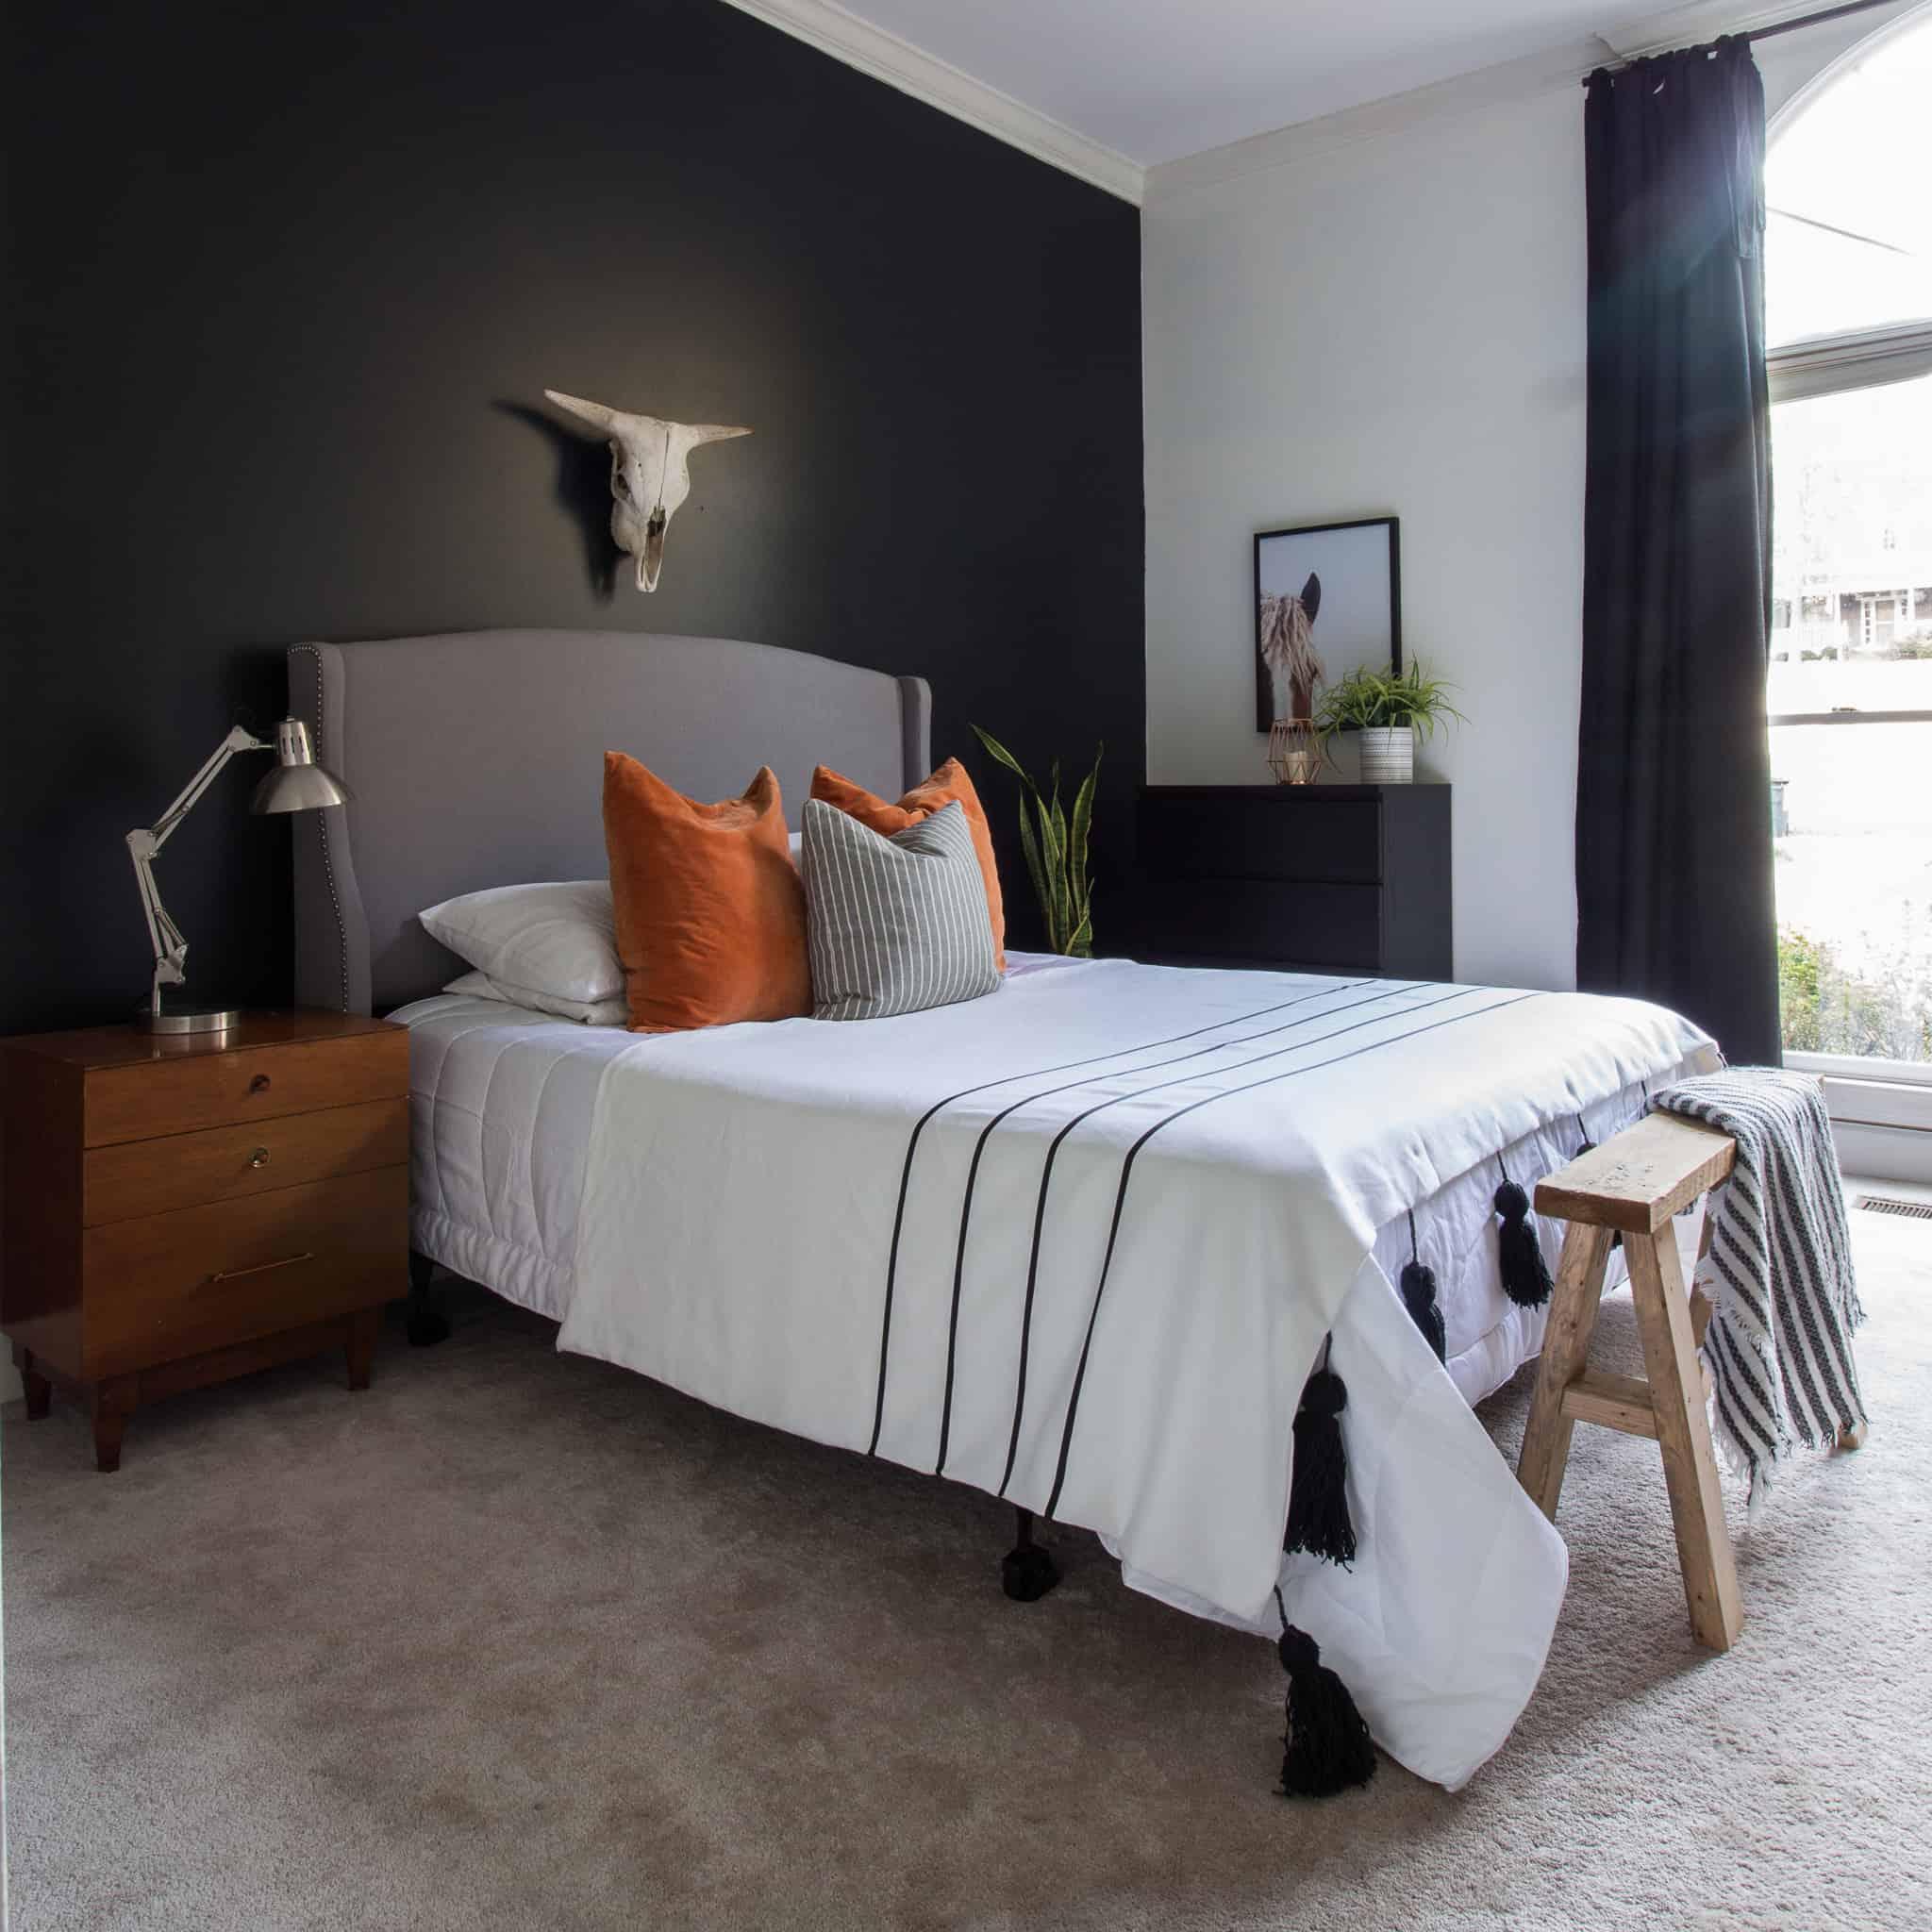 Bedroom Makeover for under $100 for the Room Challenge